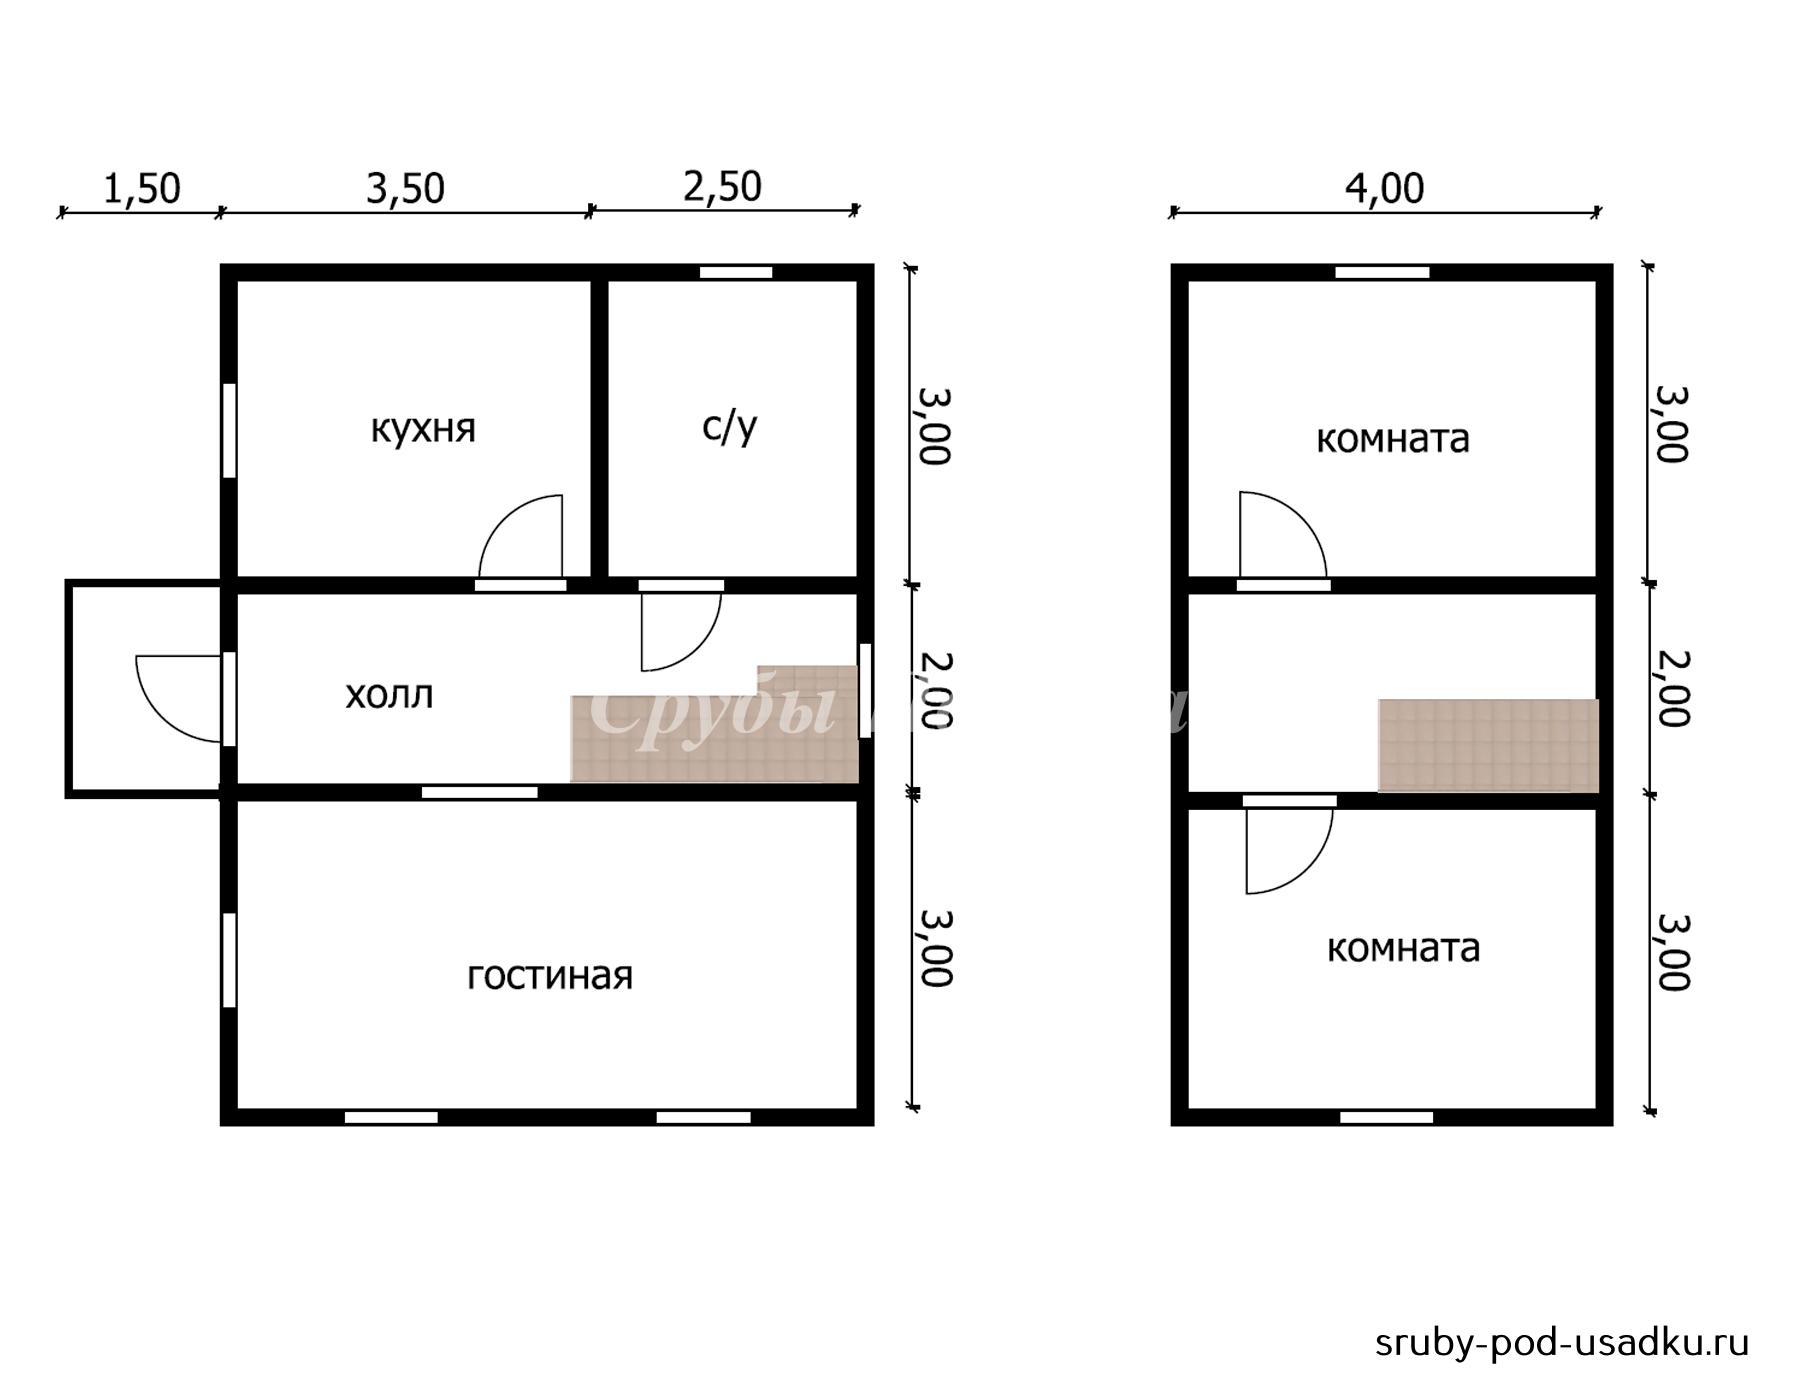 Дом из бруса под усадку 6х8 №12